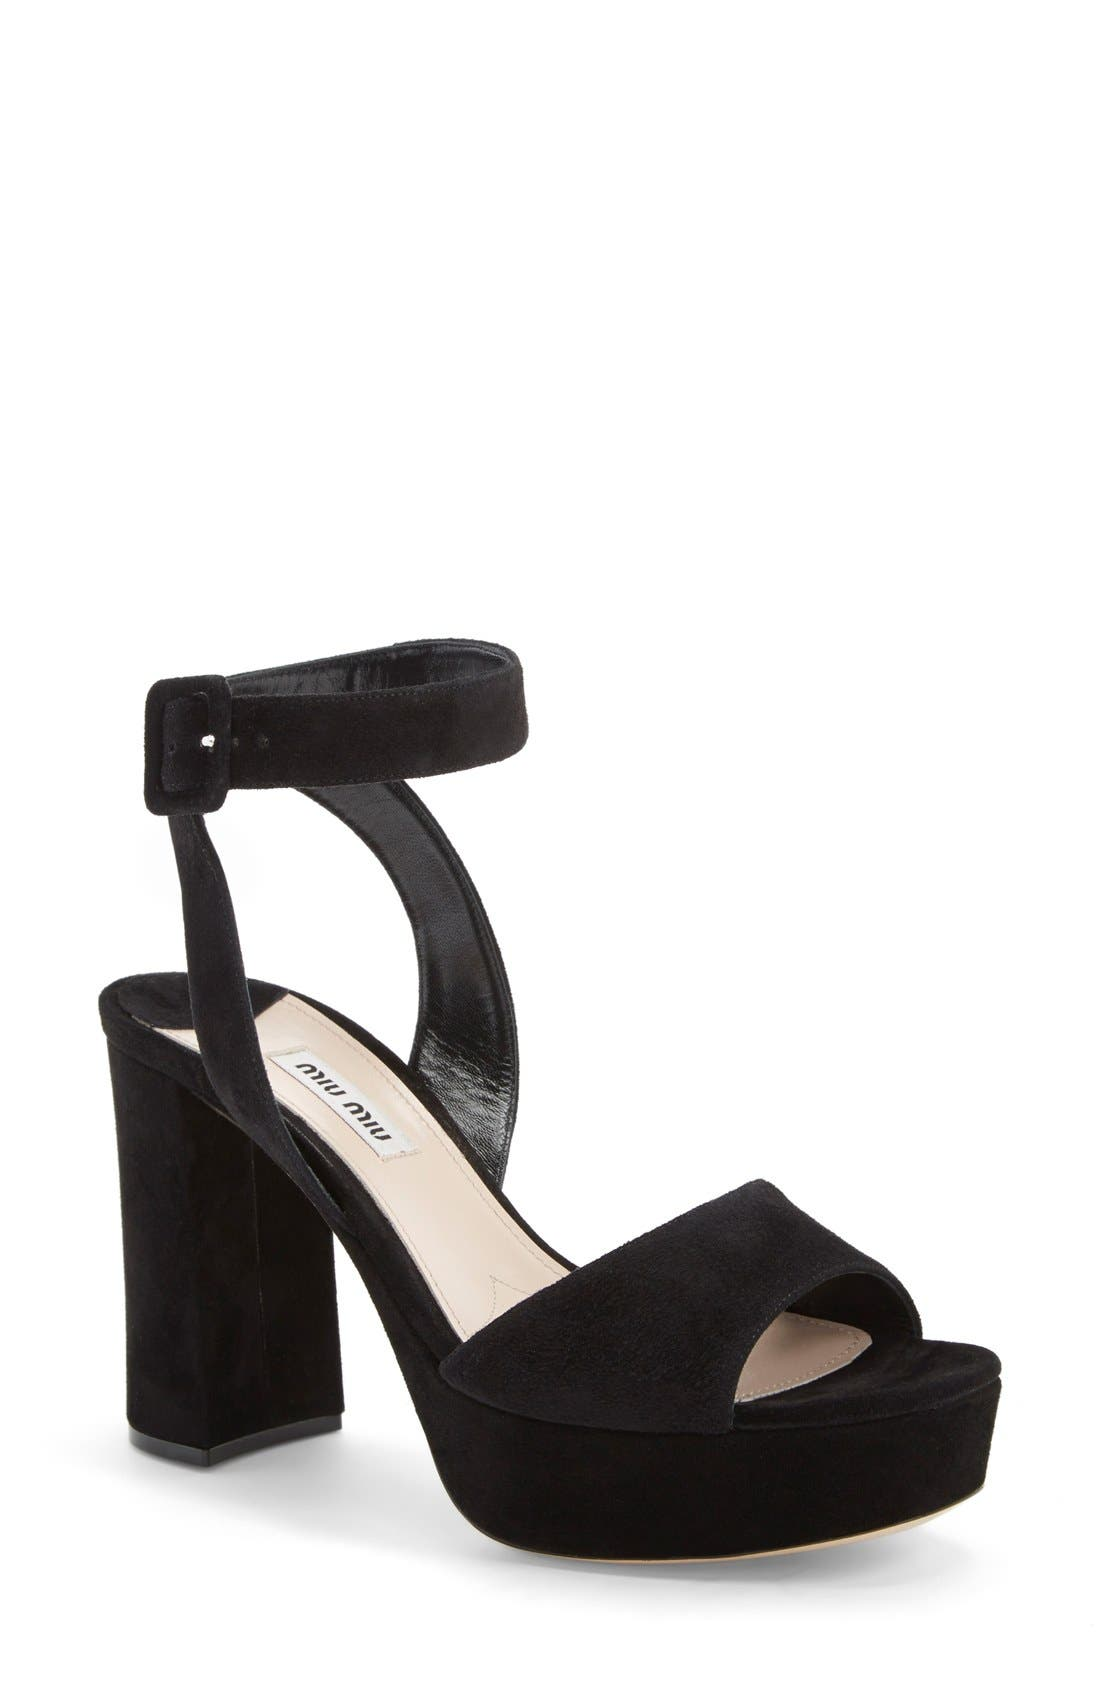 Main Image - Miu Miu Block Heel Platform Sandal (Women)